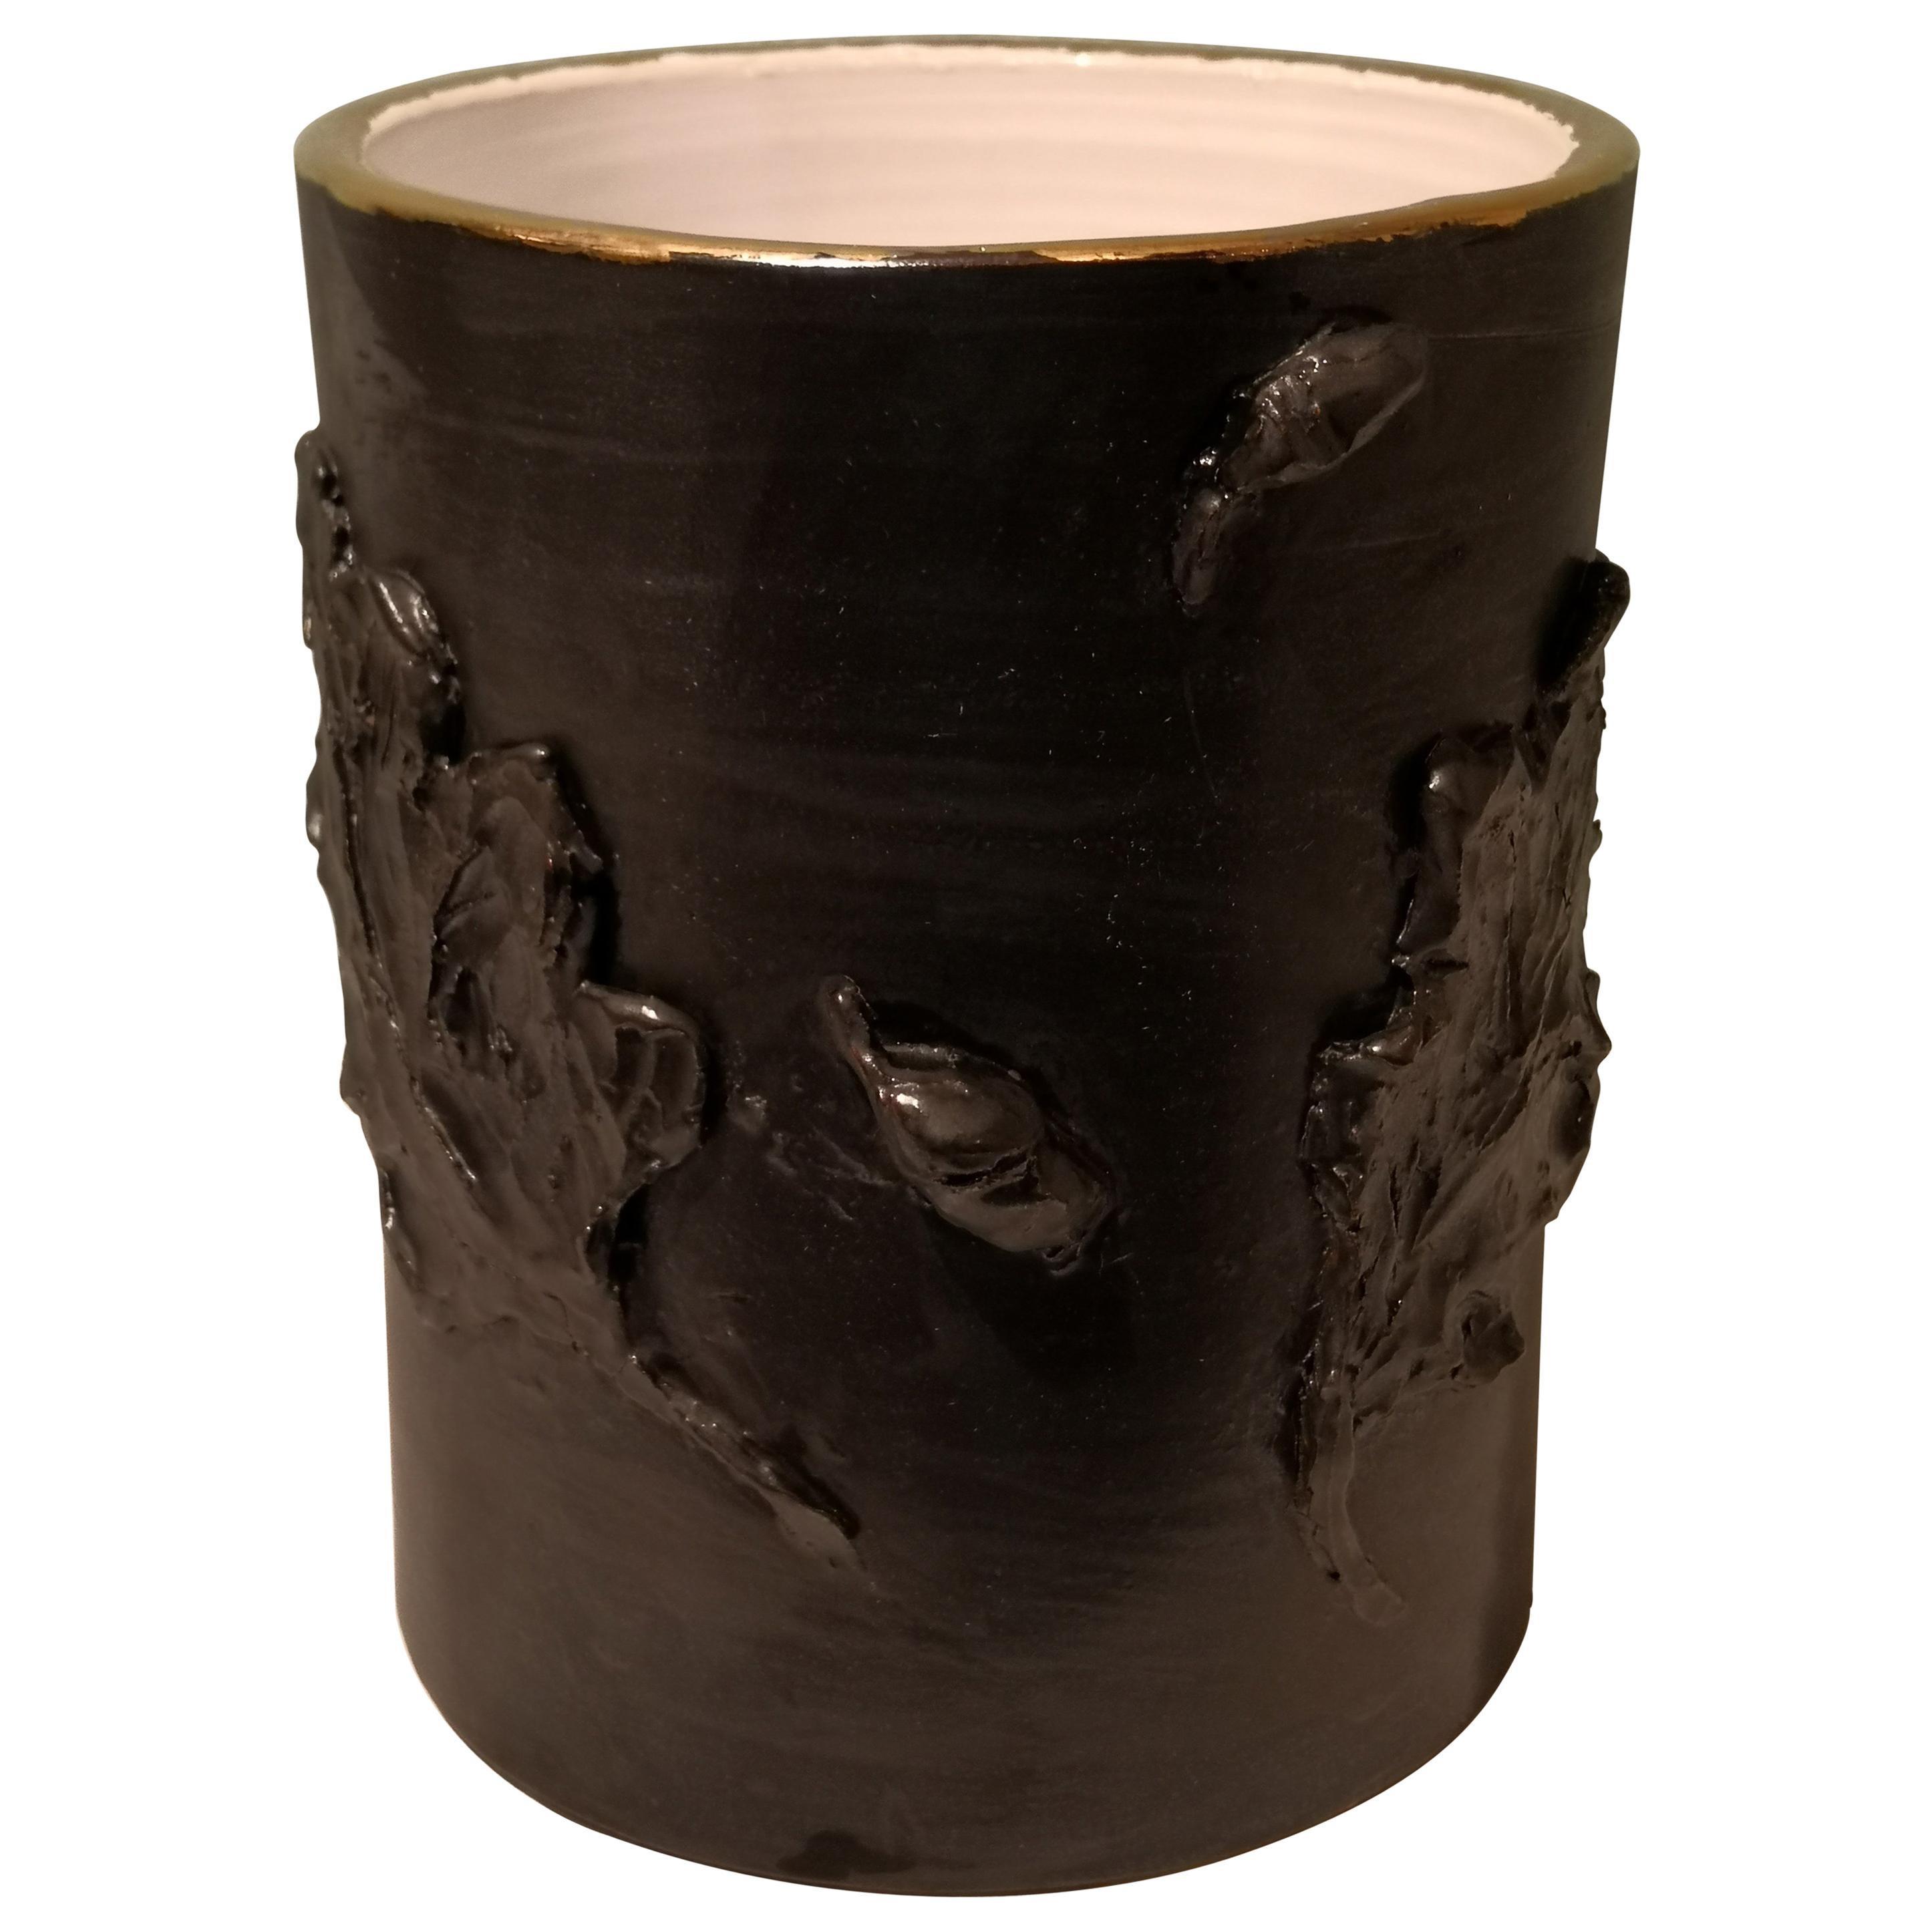 Country Style Pottery Vase Black Handmade Sofina Boutique Kitzbuehel